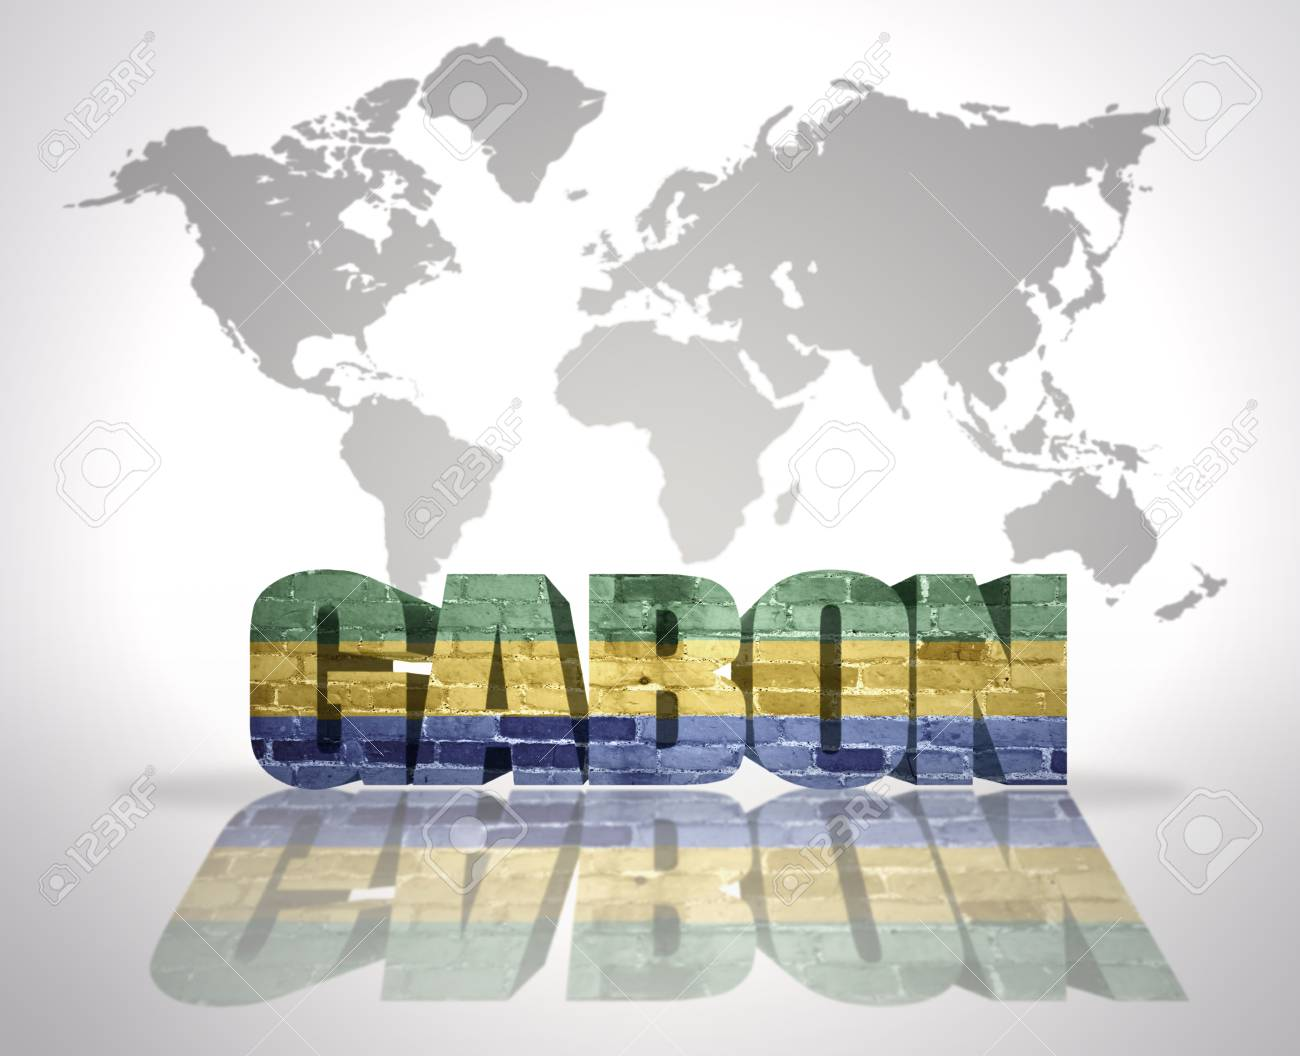 Gabon World Map.Word Gabon With Gabonese Flag On A World Map Background Stock Photo